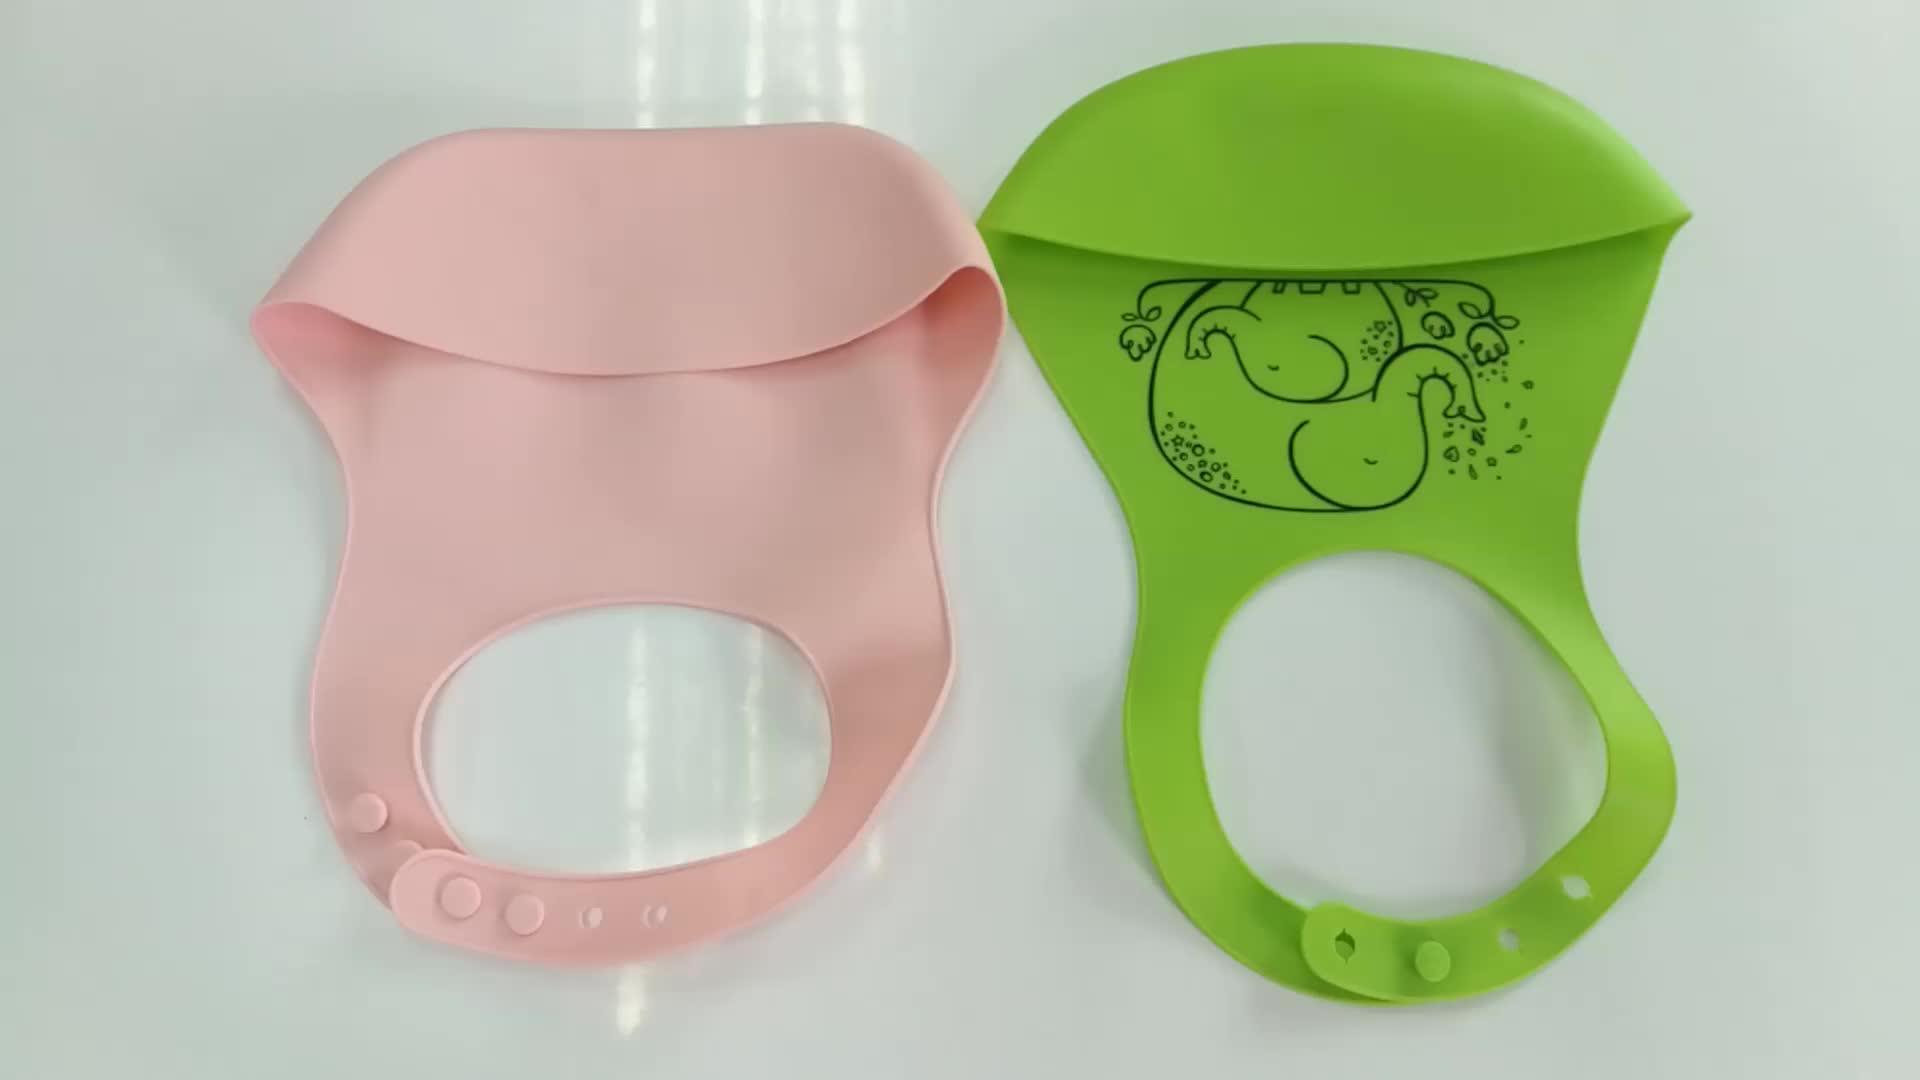 Collapsible Food grade Baby Silicone Feeding Bib